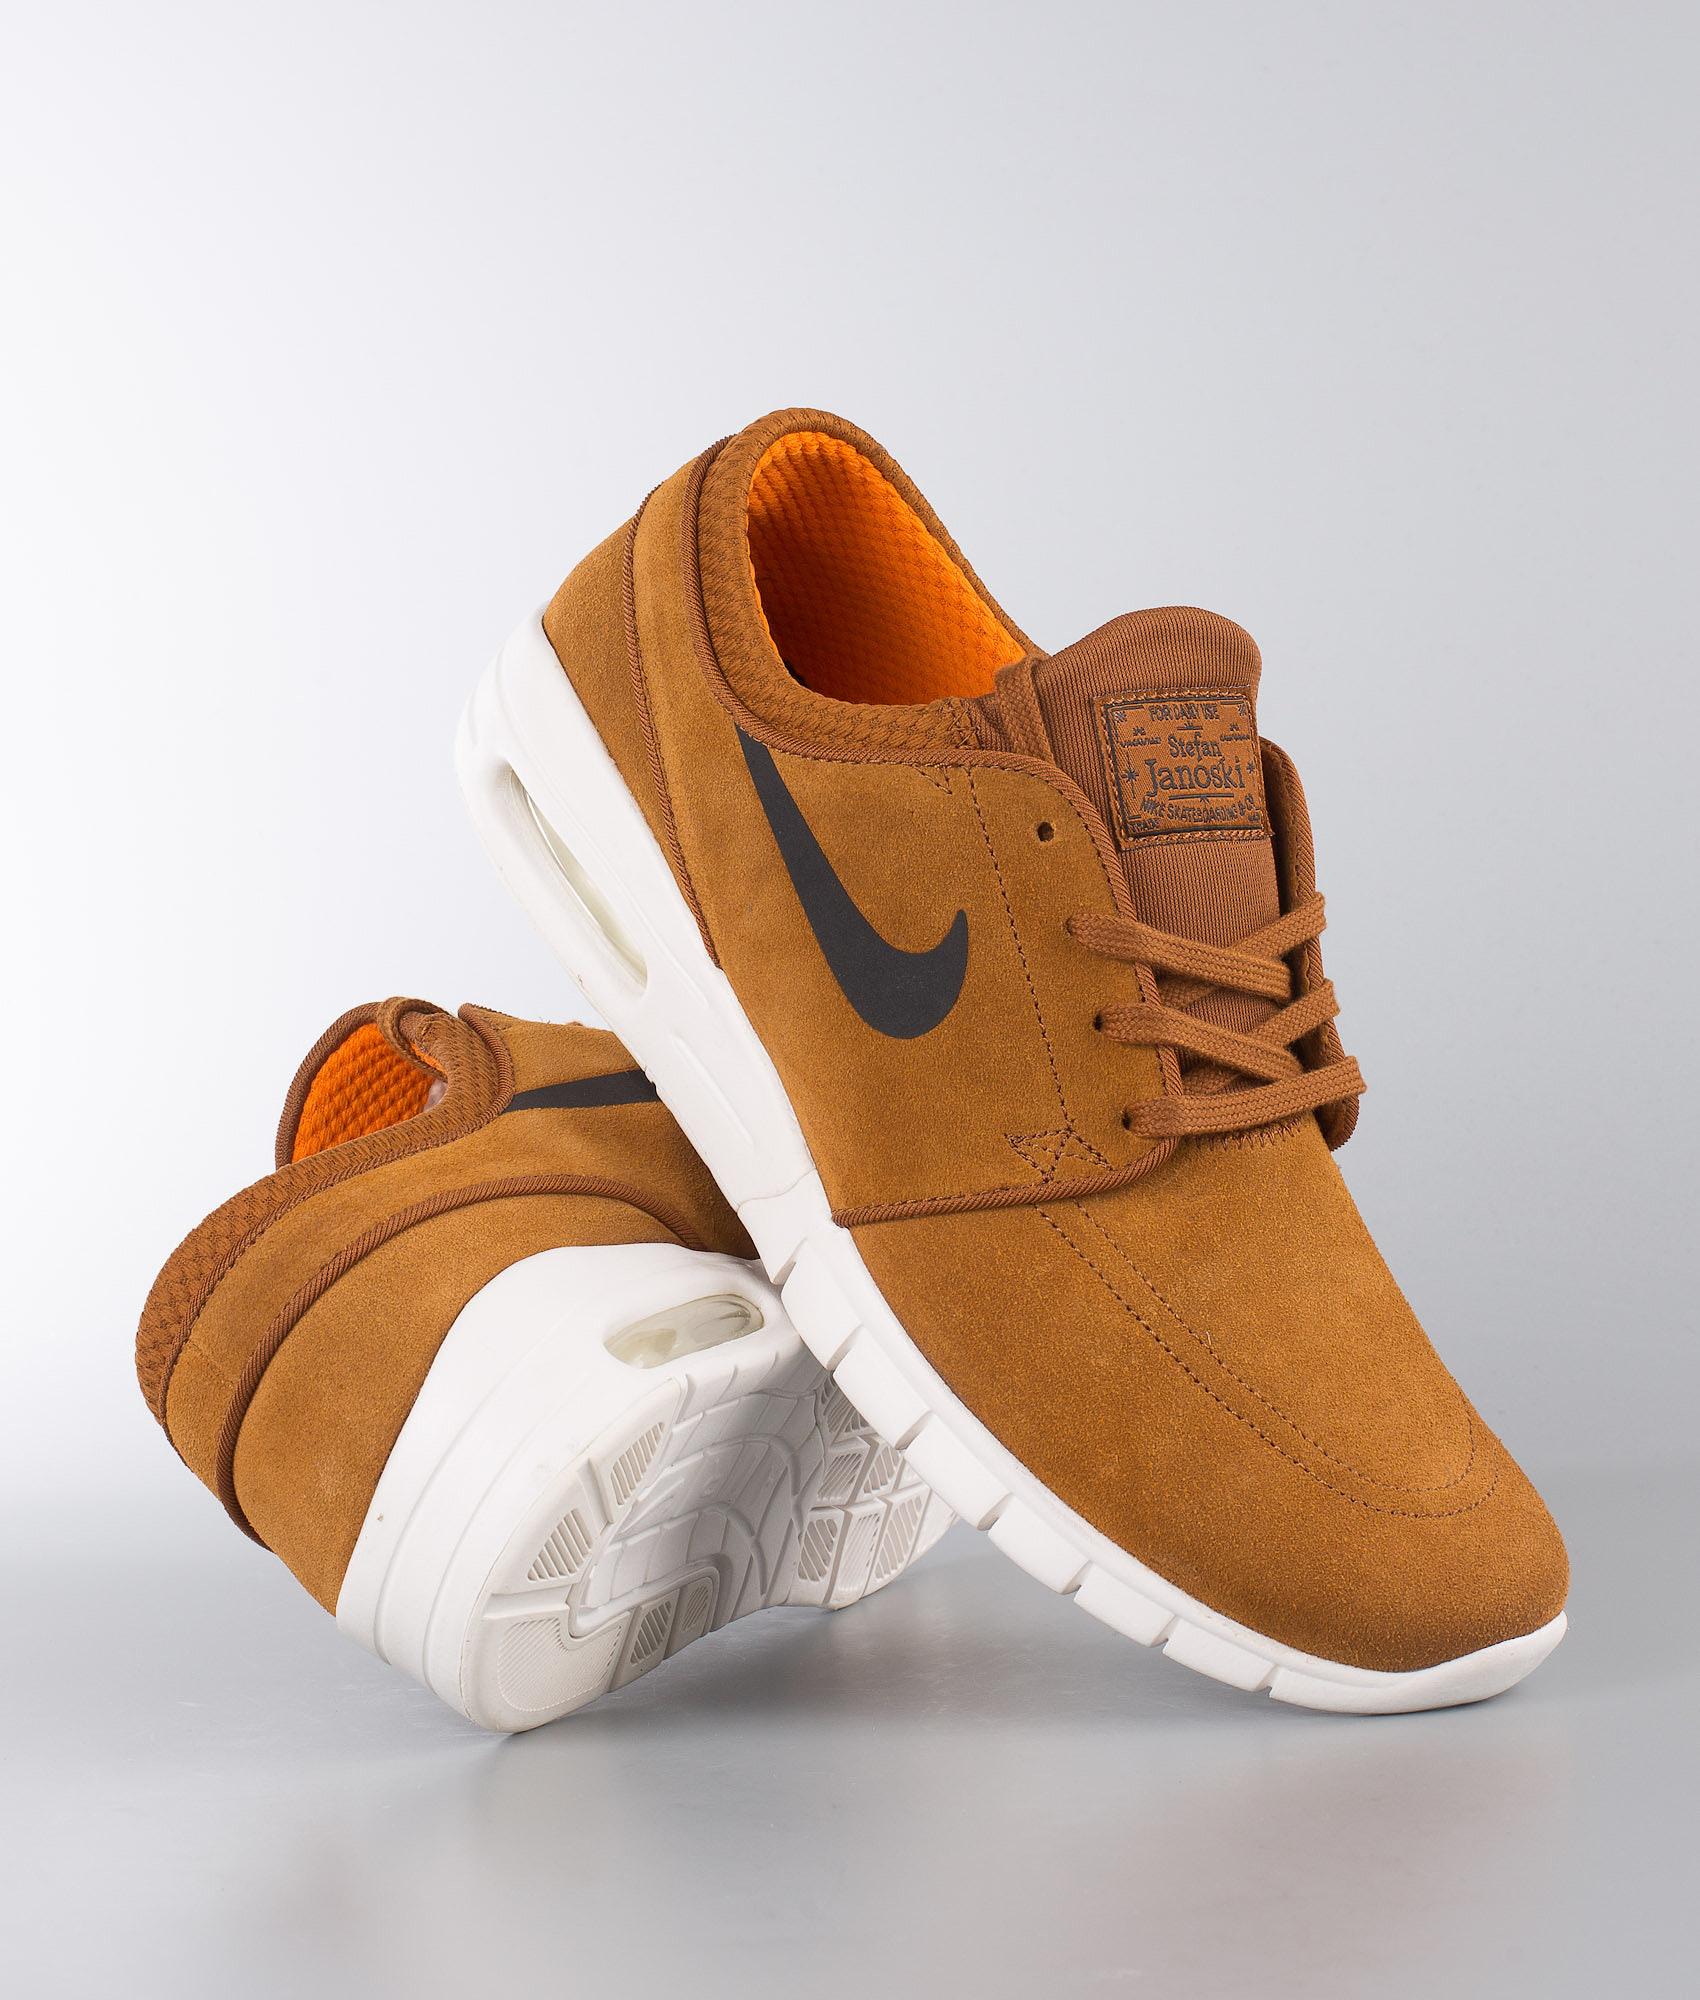 047d7ec2087 Nike Stefan Janoski Max L Shoes Hazelnut Black-Ivory-Clay Orange ...